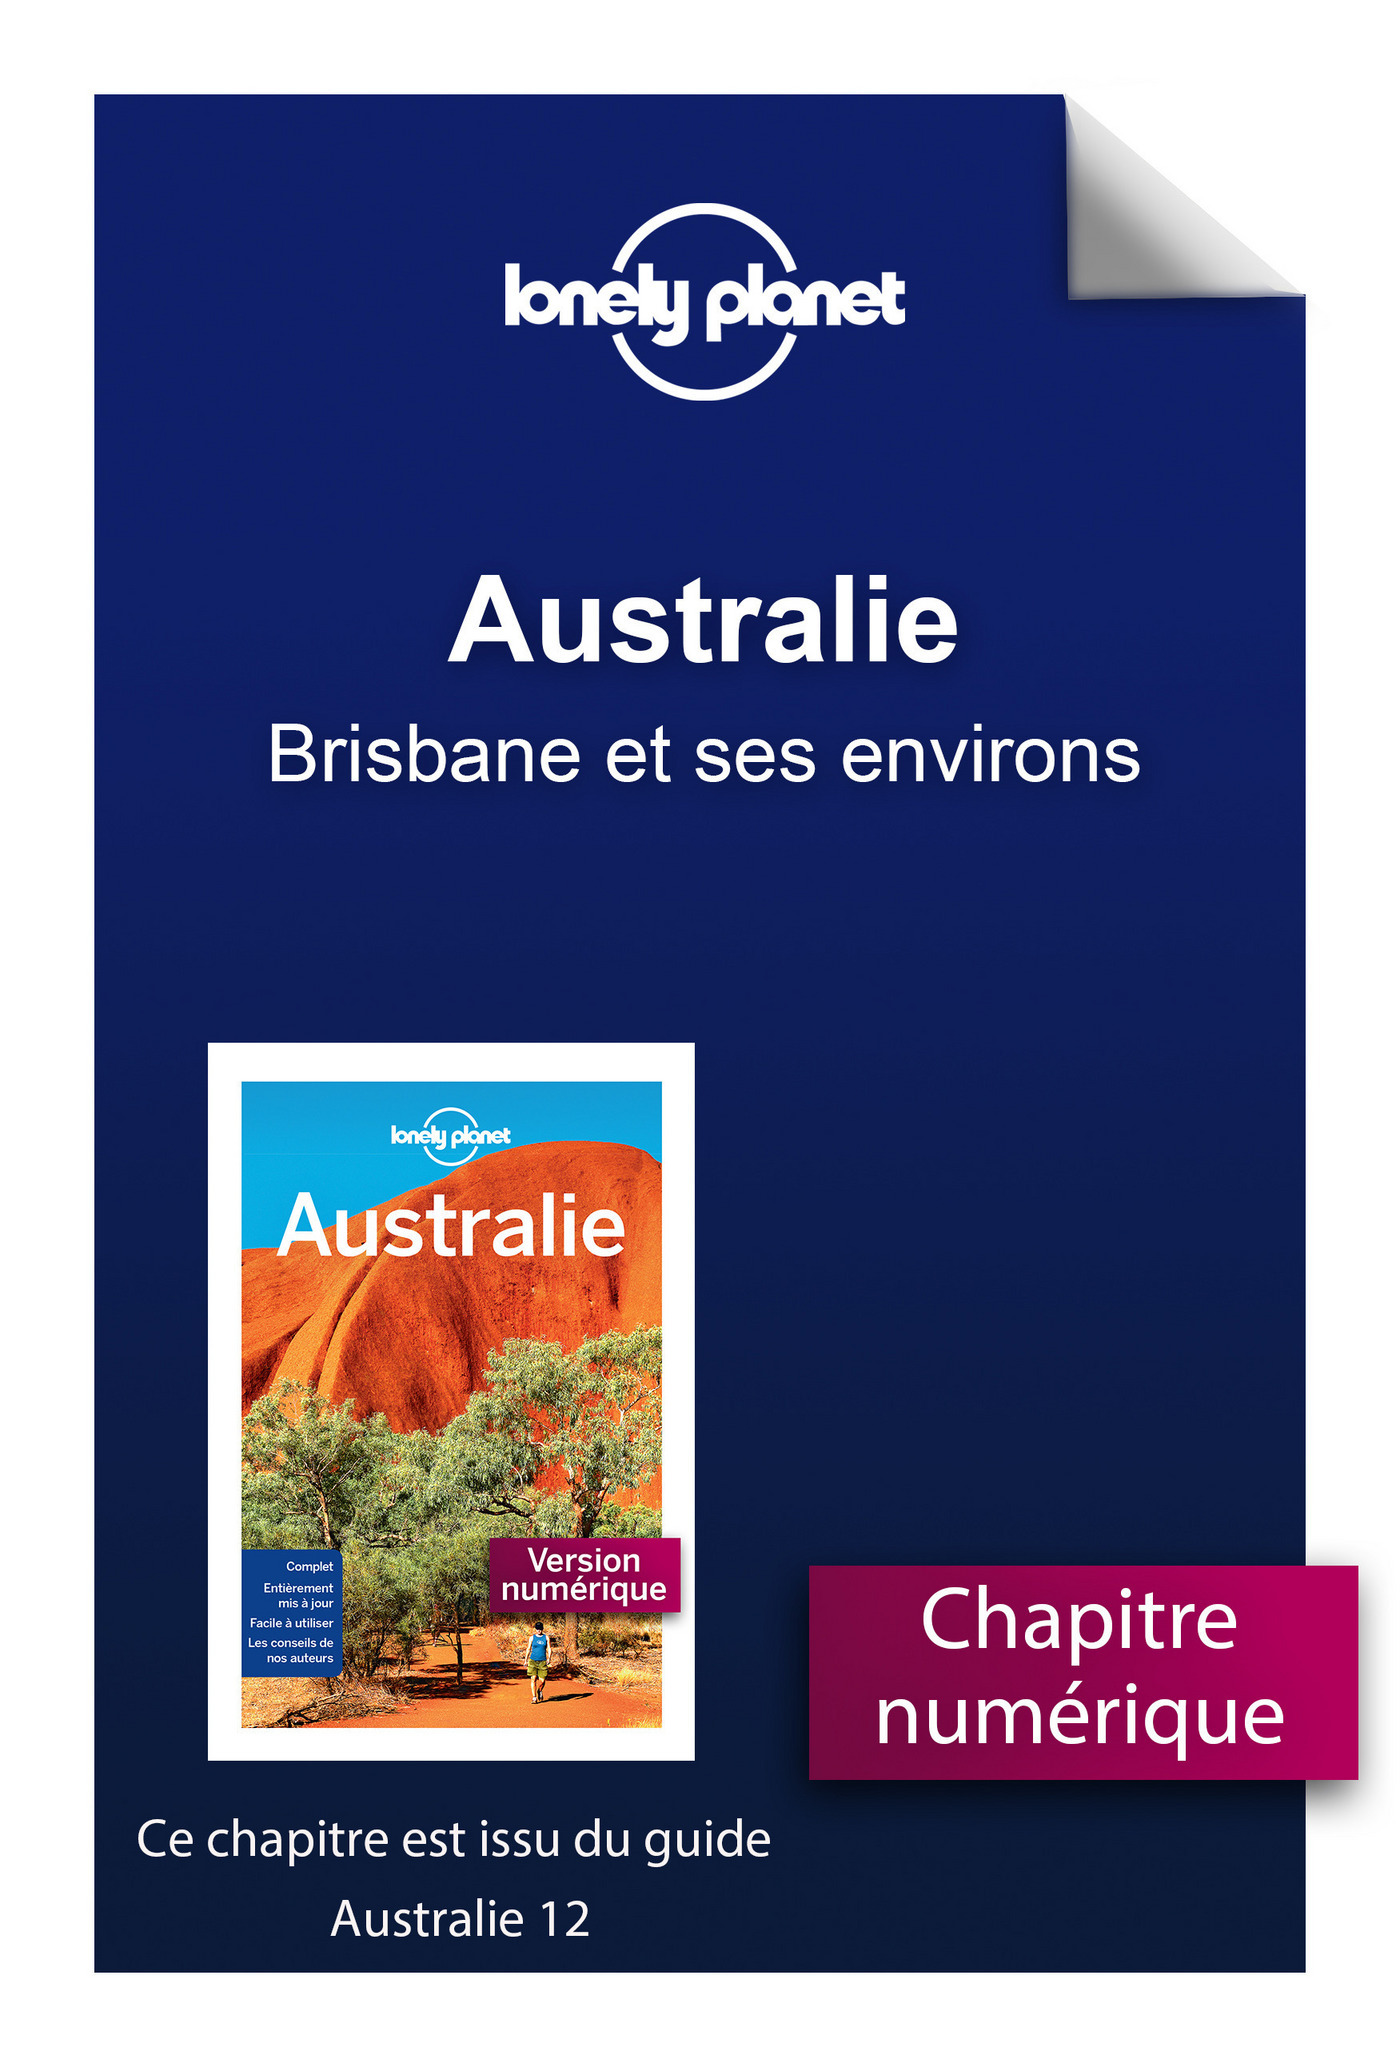 Australie - Brisbane et ses environs